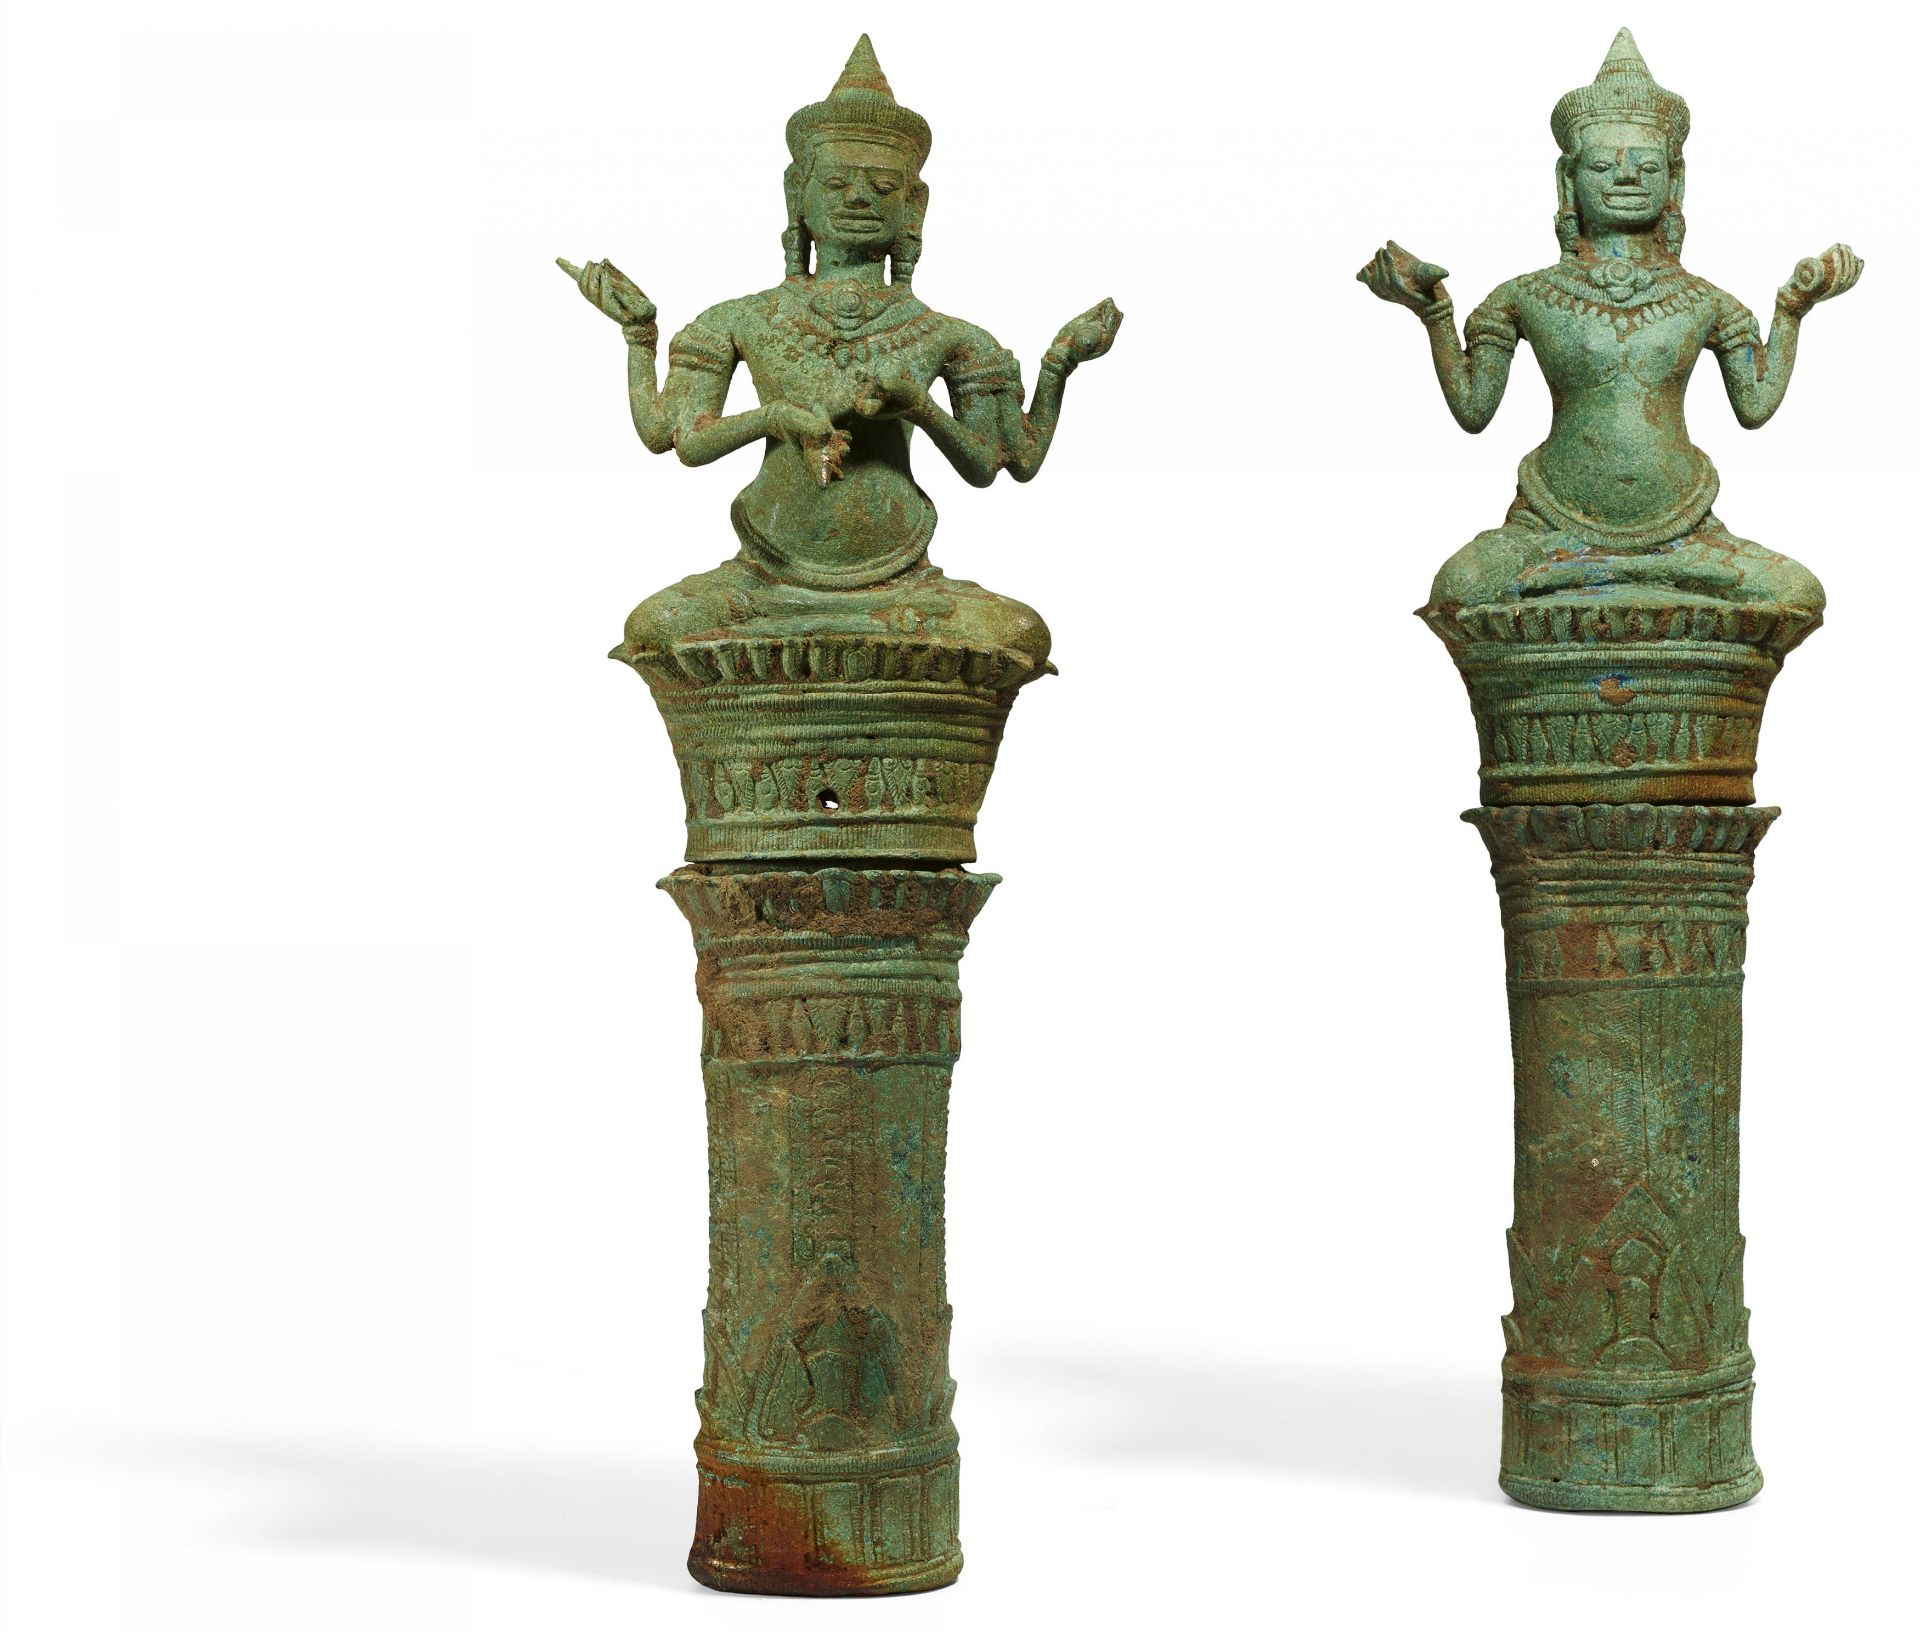 Los 55 - TWO RARE TANTRIC BUDDHIST FIGURES ON HIGH PEDESTALS. Origin: Khmer. Angkor Wat. Dynasty: Bayon